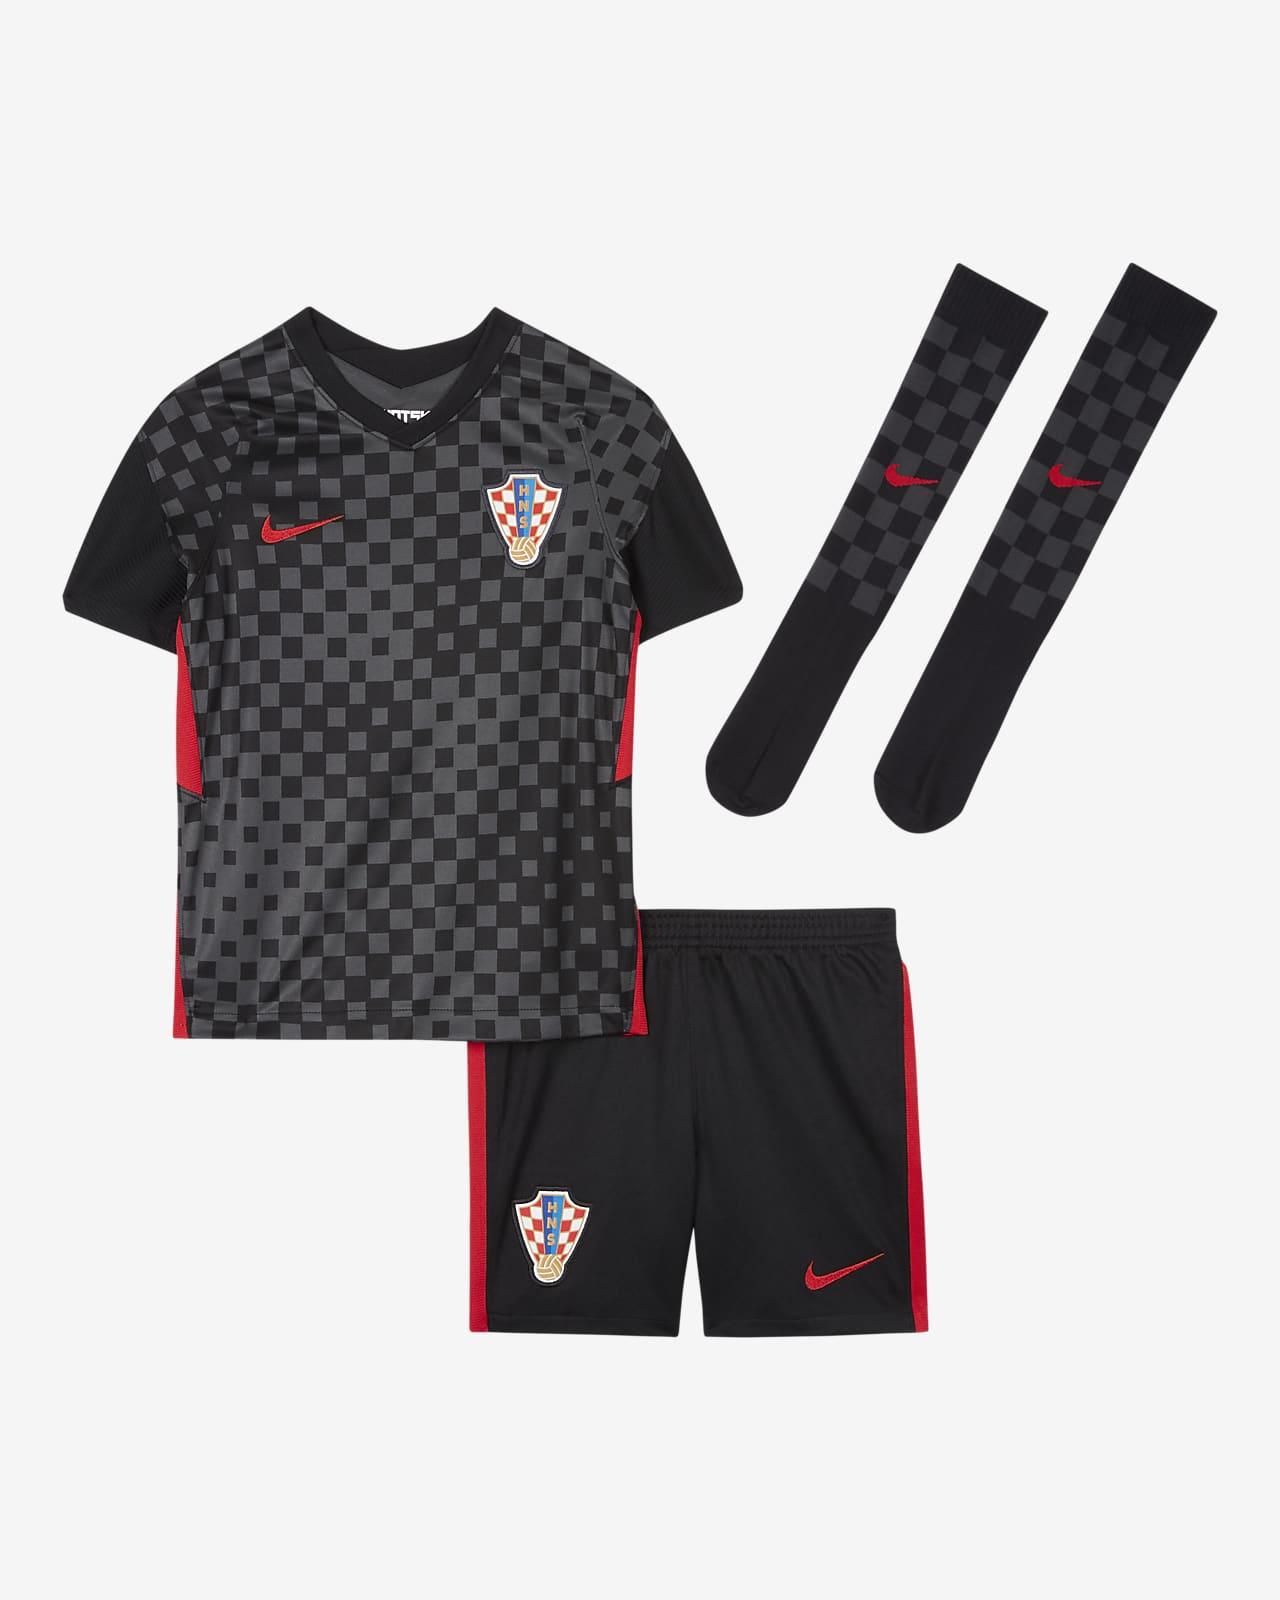 Croatia 2020 Away Younger Kids' Football Kit